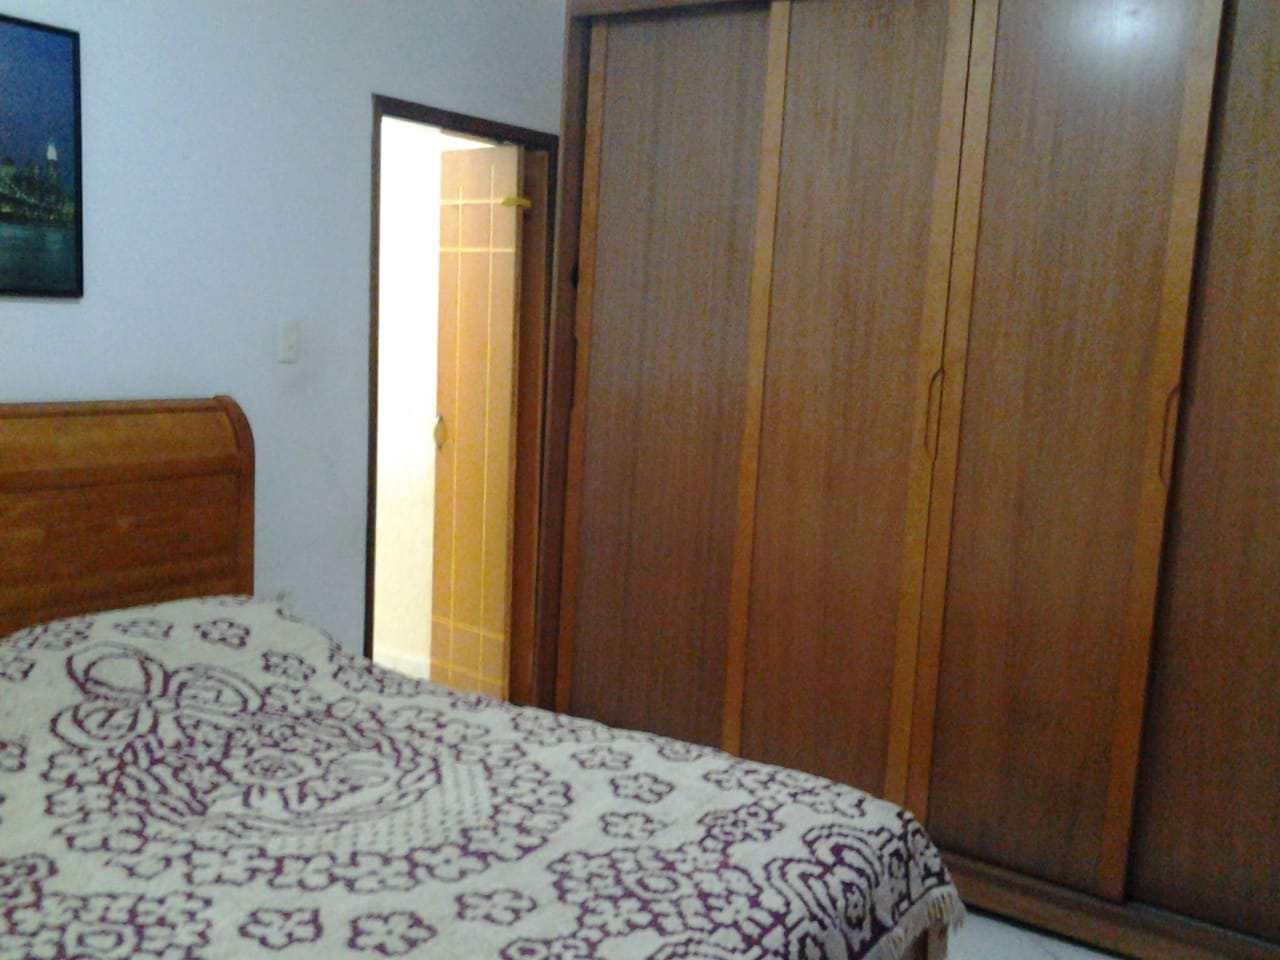 Sobrado com 4 dorms, Jardim Ipanema, Santo André - R$ 415 mil, Cod: 1683